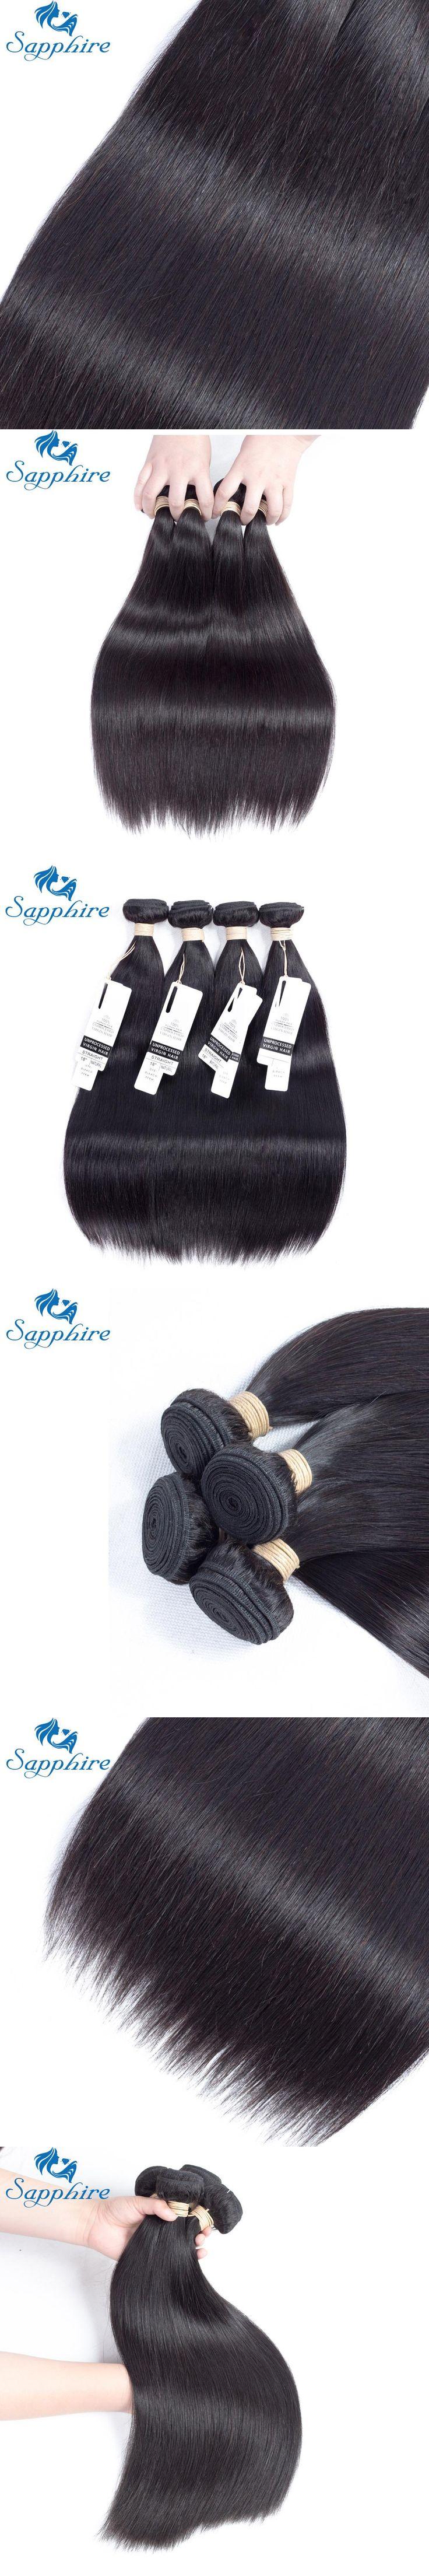 Sapphire Hair Products 4PCS/Lot Malaysian Straight Human Remy Hair Bundles Natural Back Malaysian Hair Weaving For Hair Salon